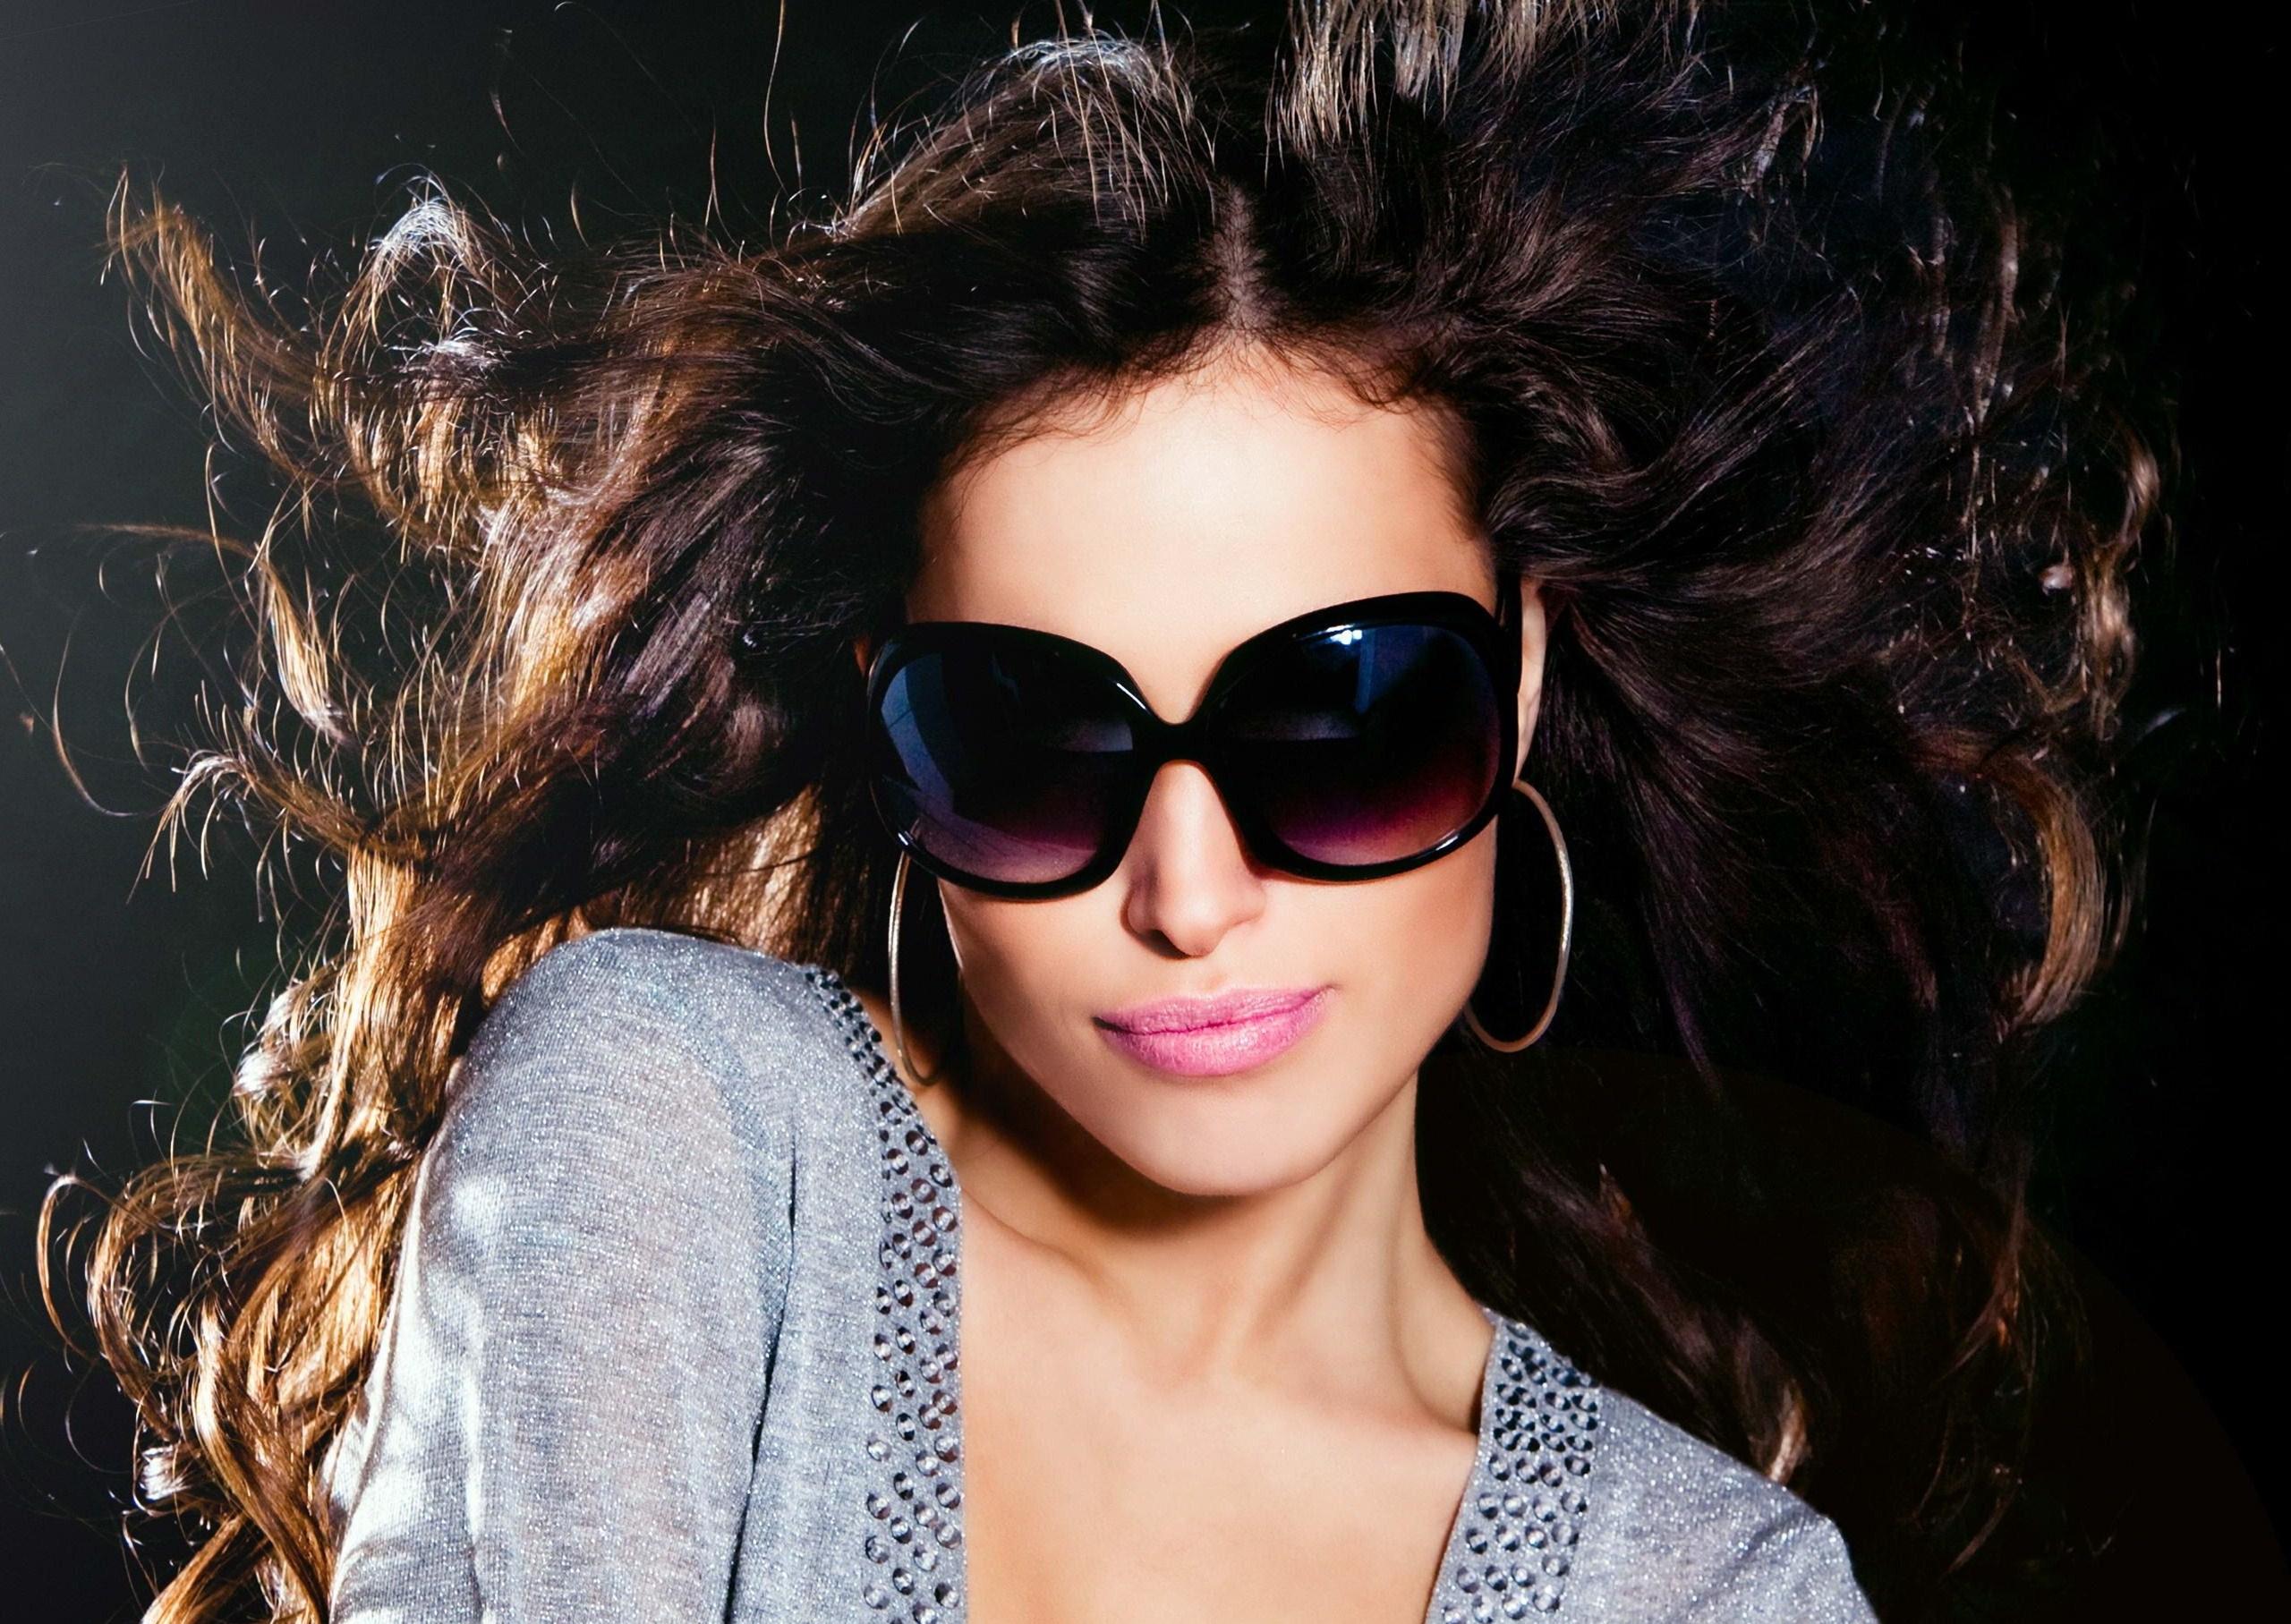 Девушка в очках на аву фото